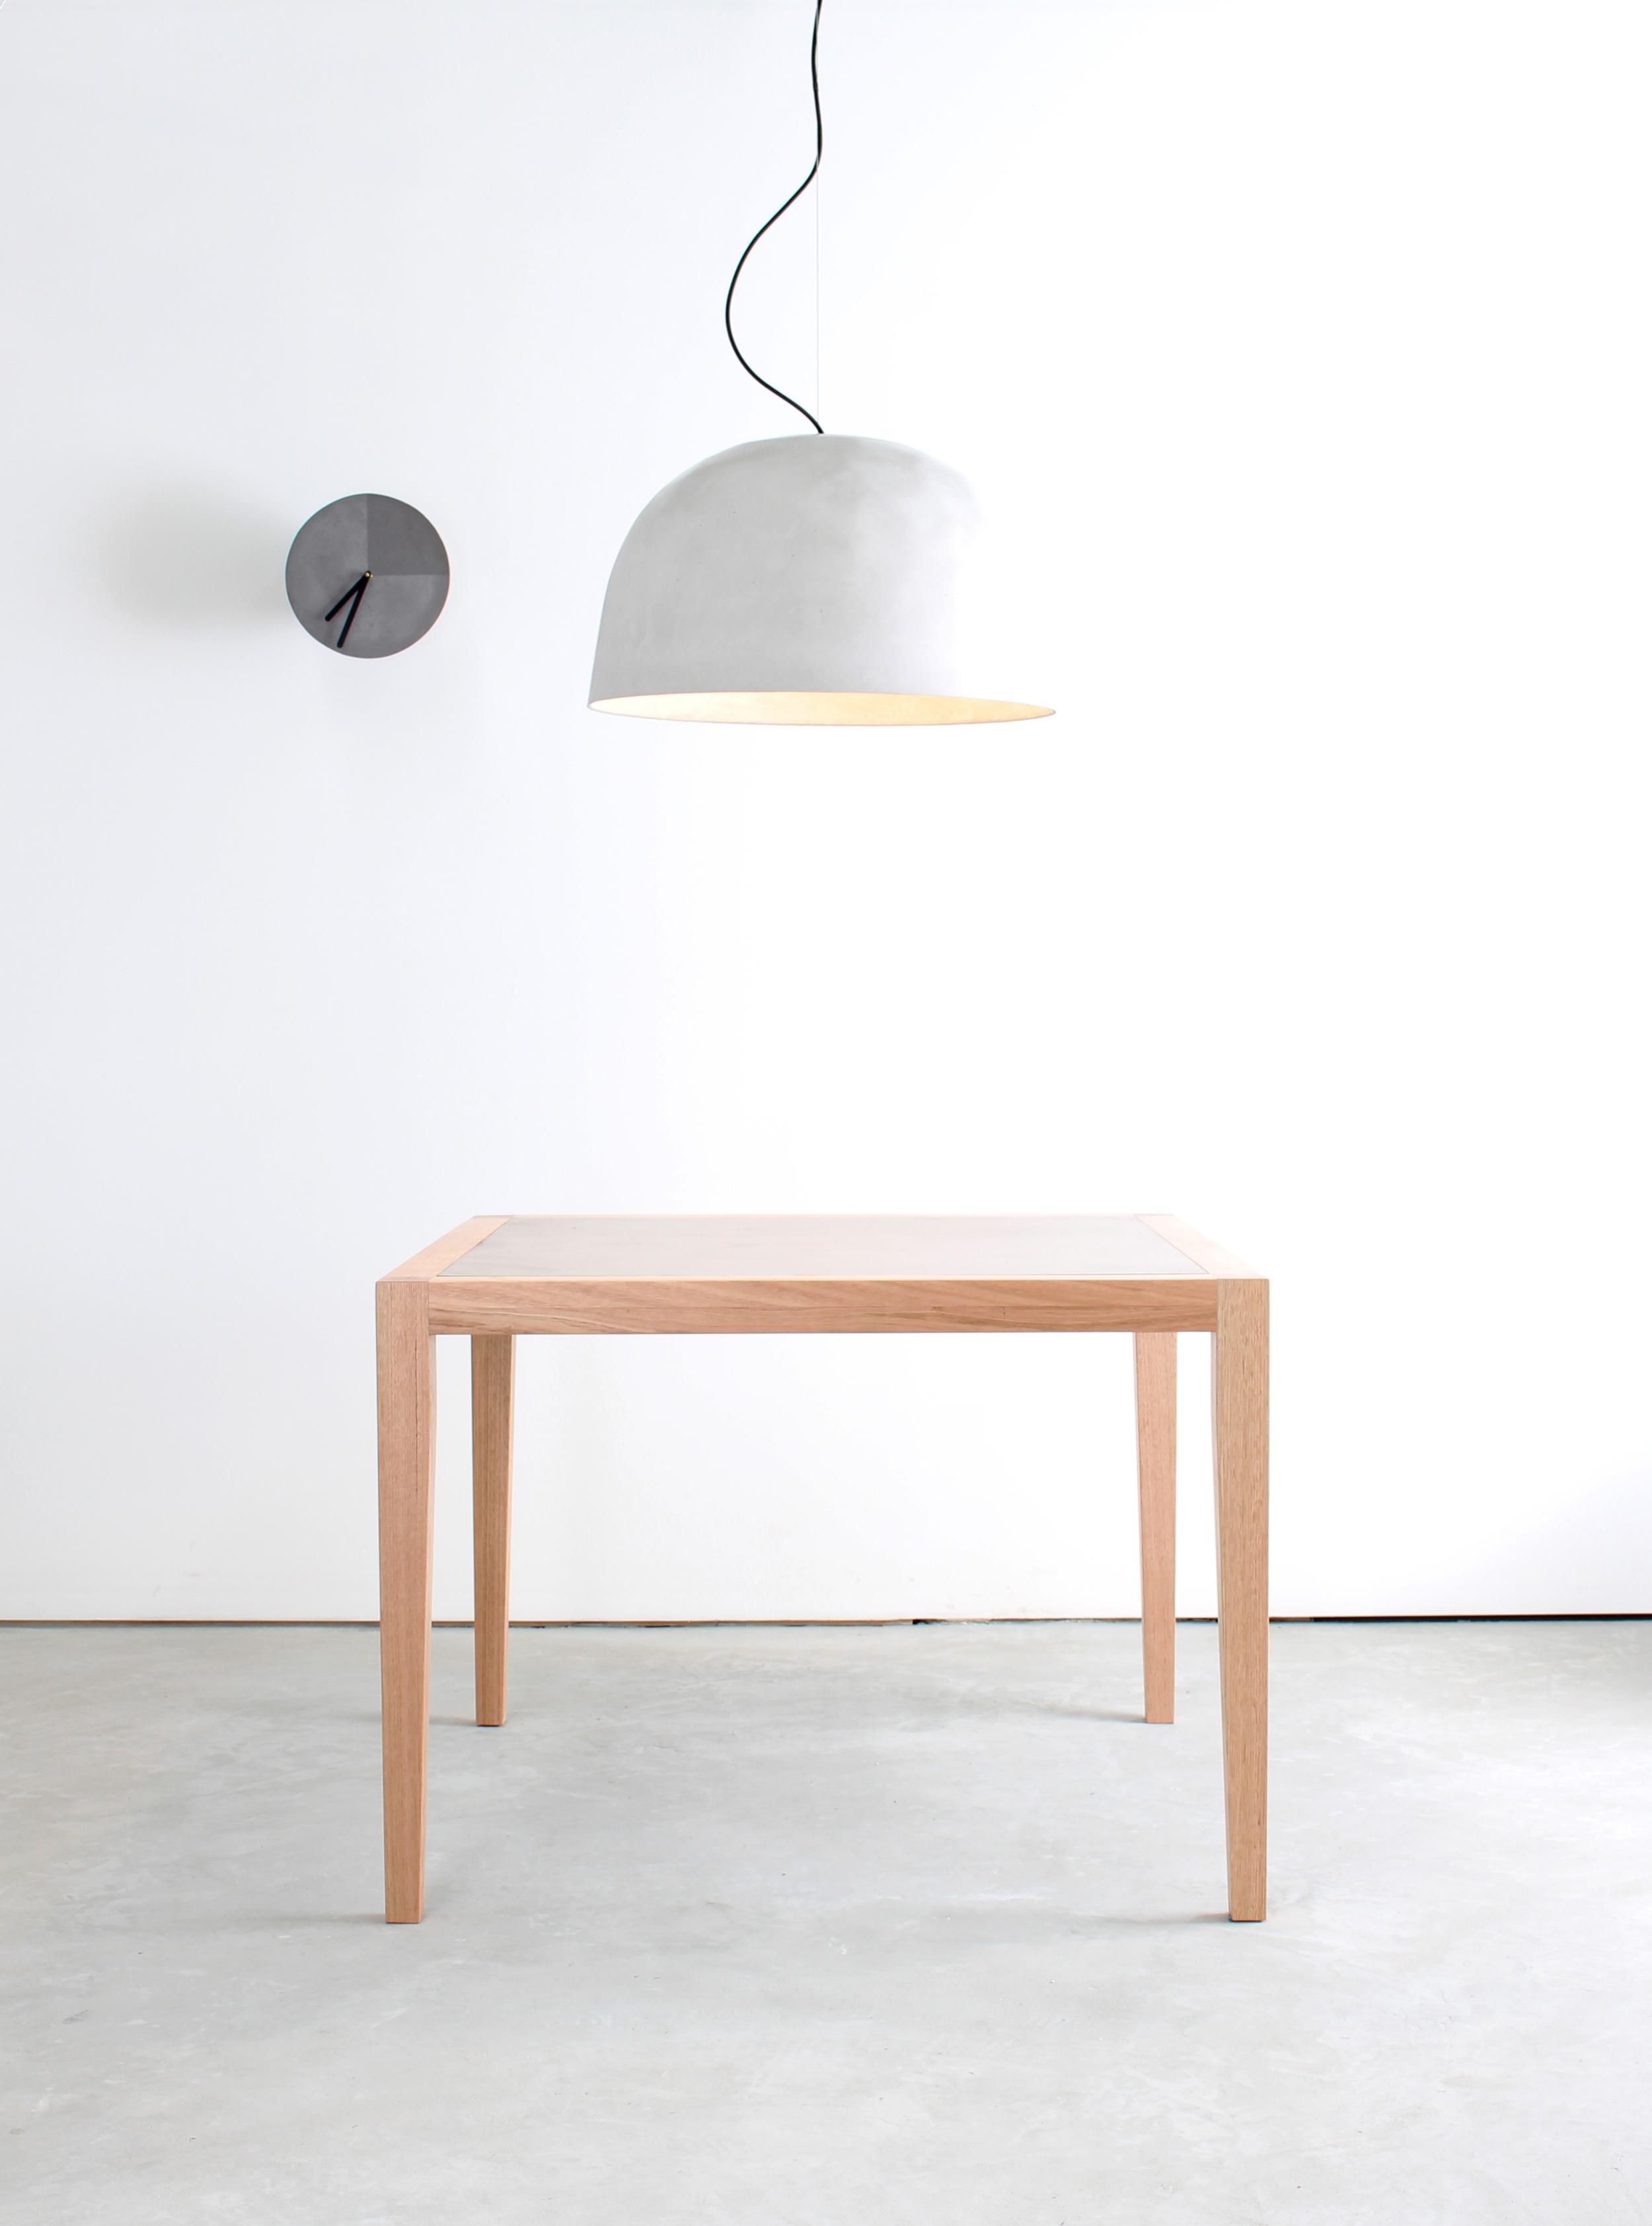 Snowi Concrete Pendant Light with Neli Dining Table